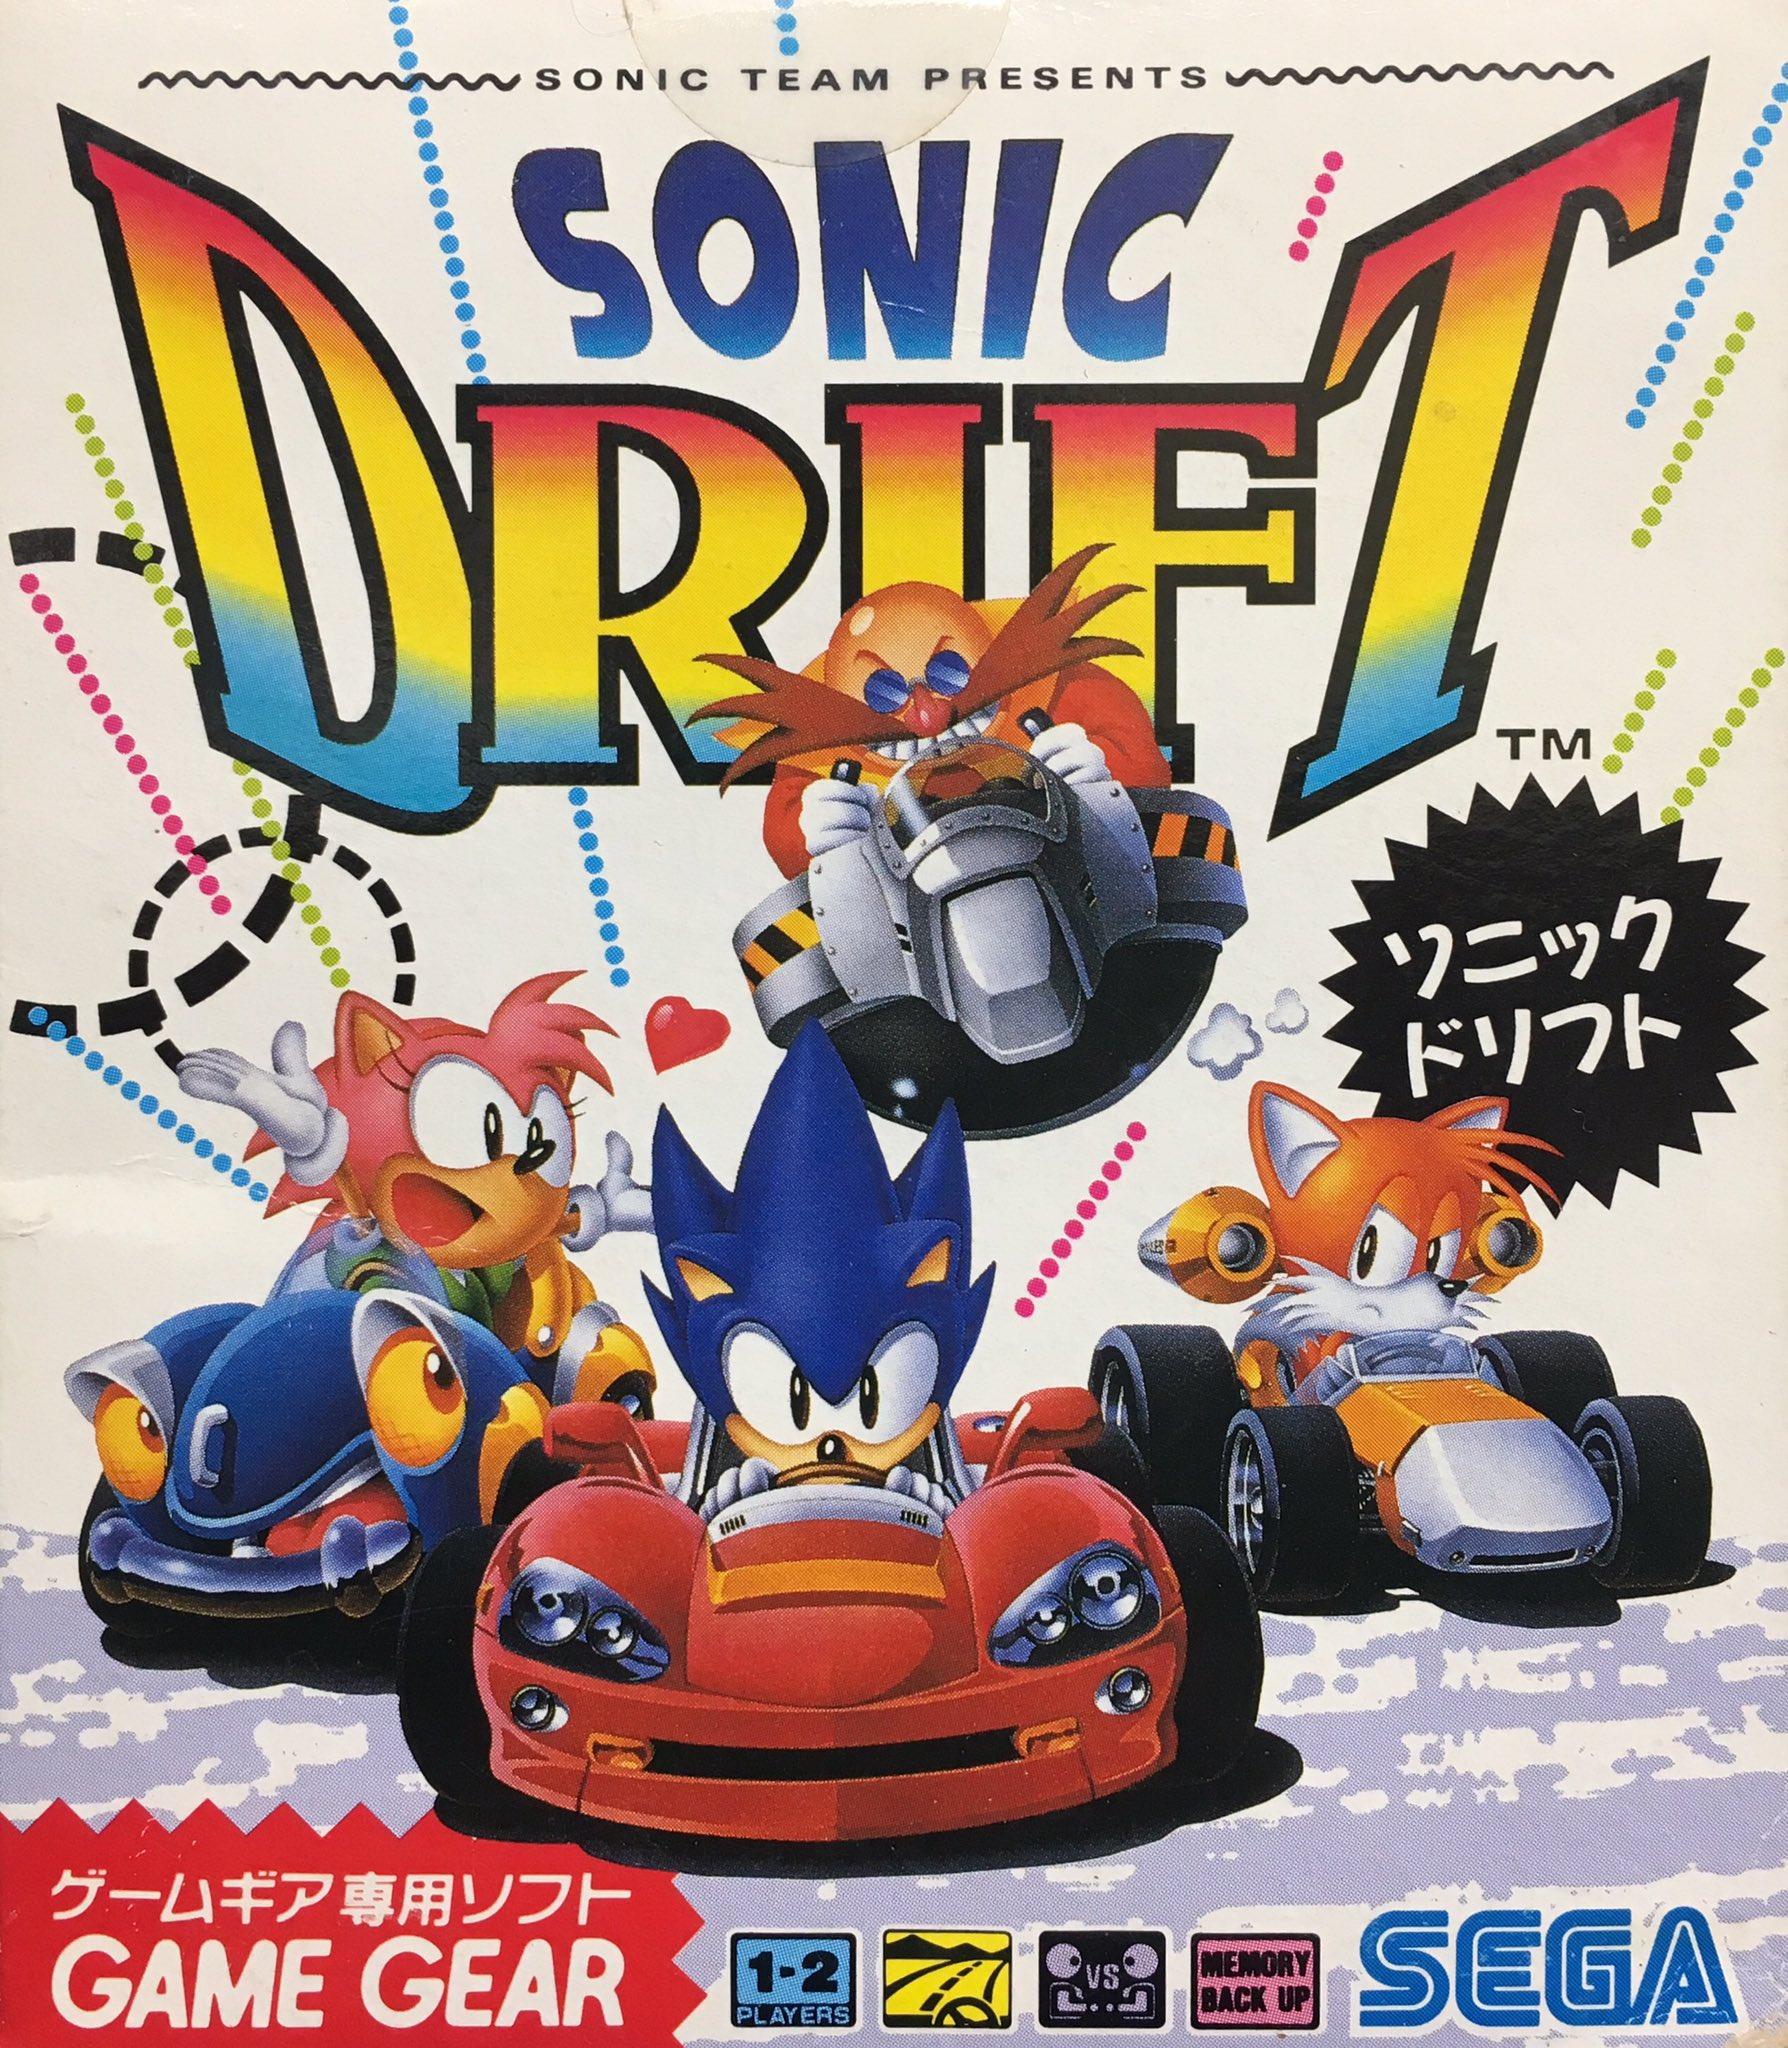 Sonic drift 2 game gear the venitan hotel and casino